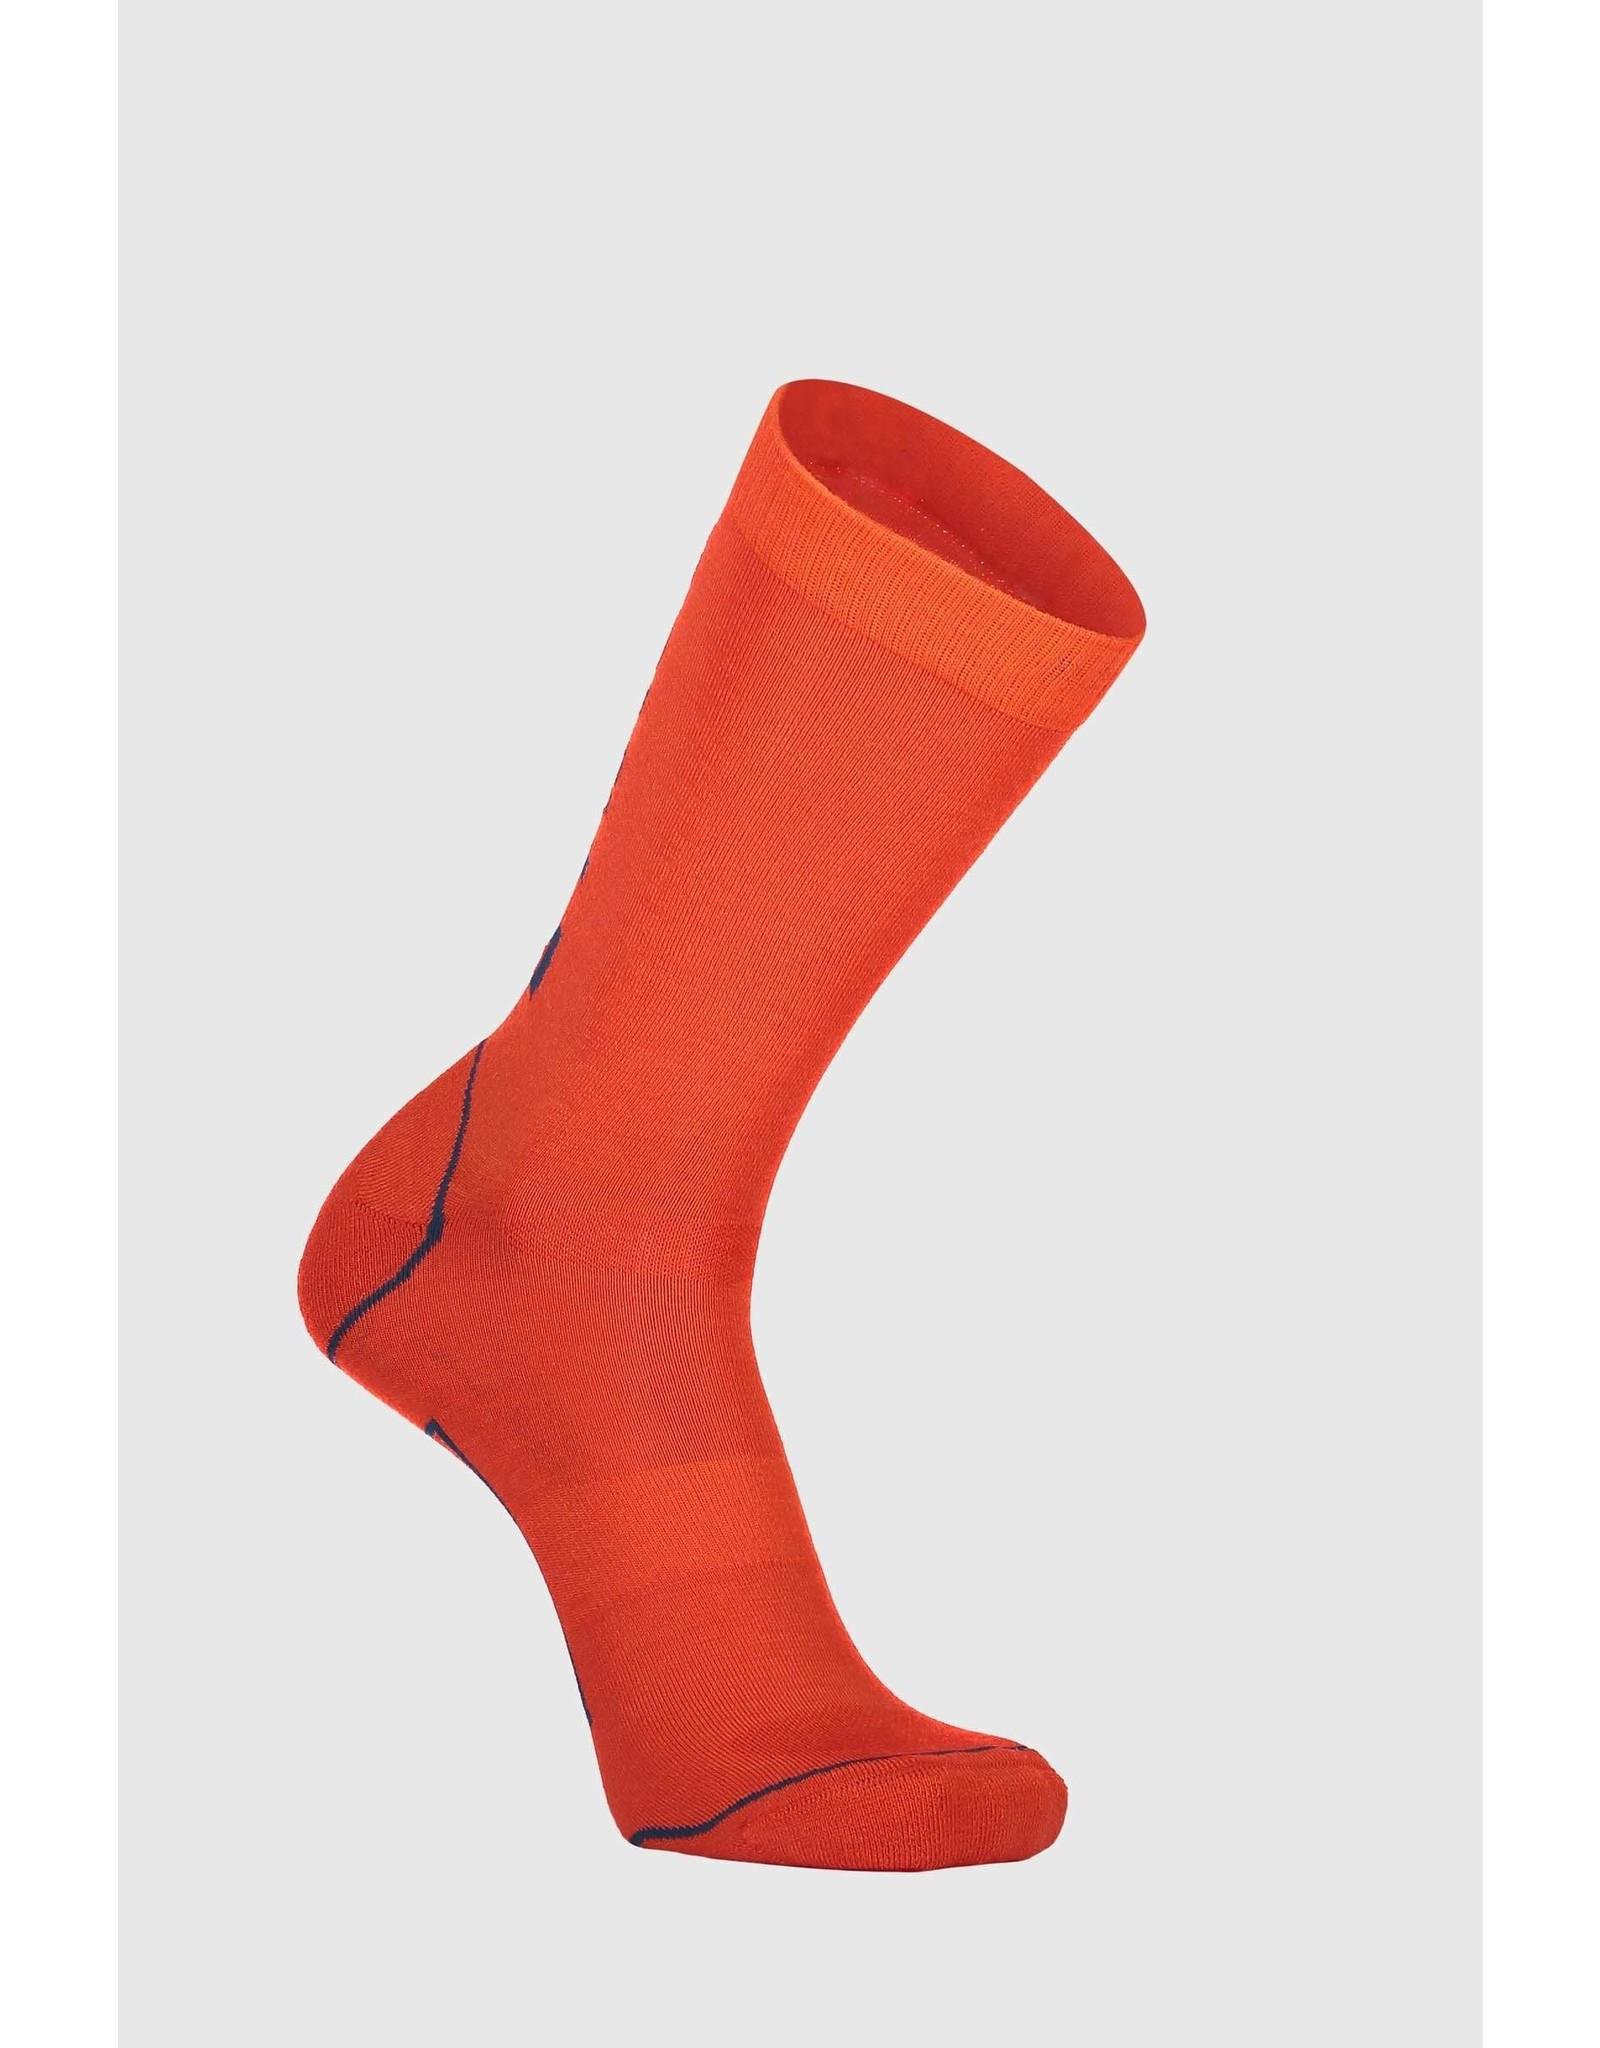 Mons Royale Mons Royale Men's Tech Sock 2.0